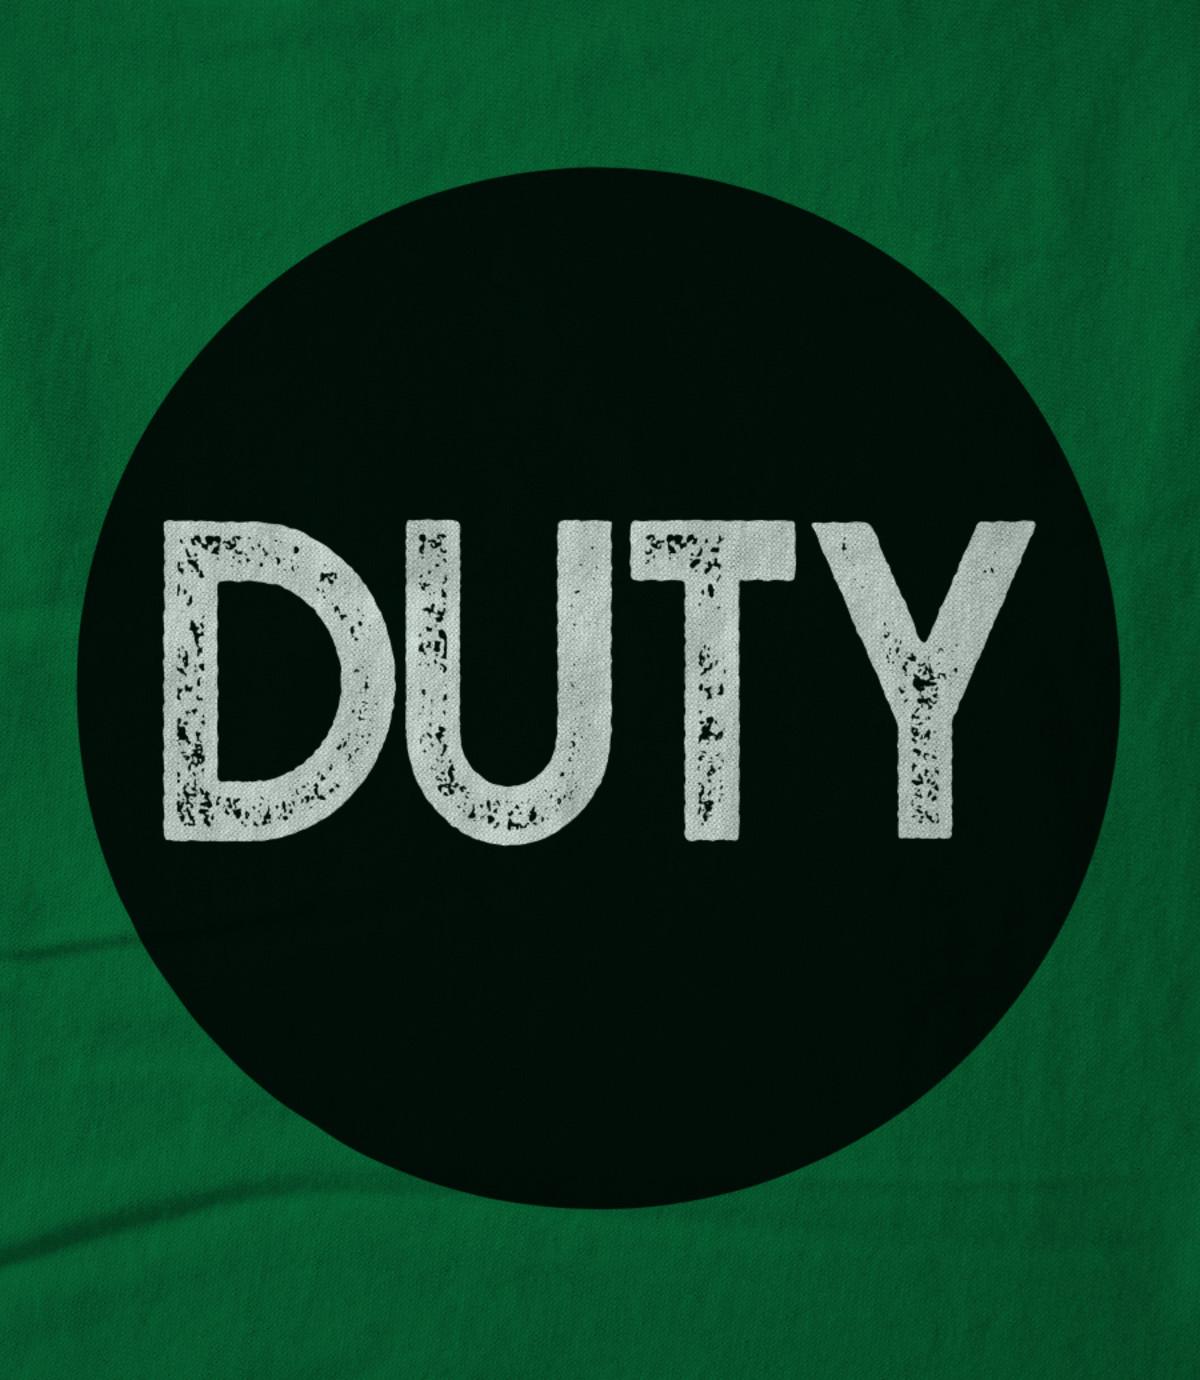 Duty duty circle logo green 1542364193